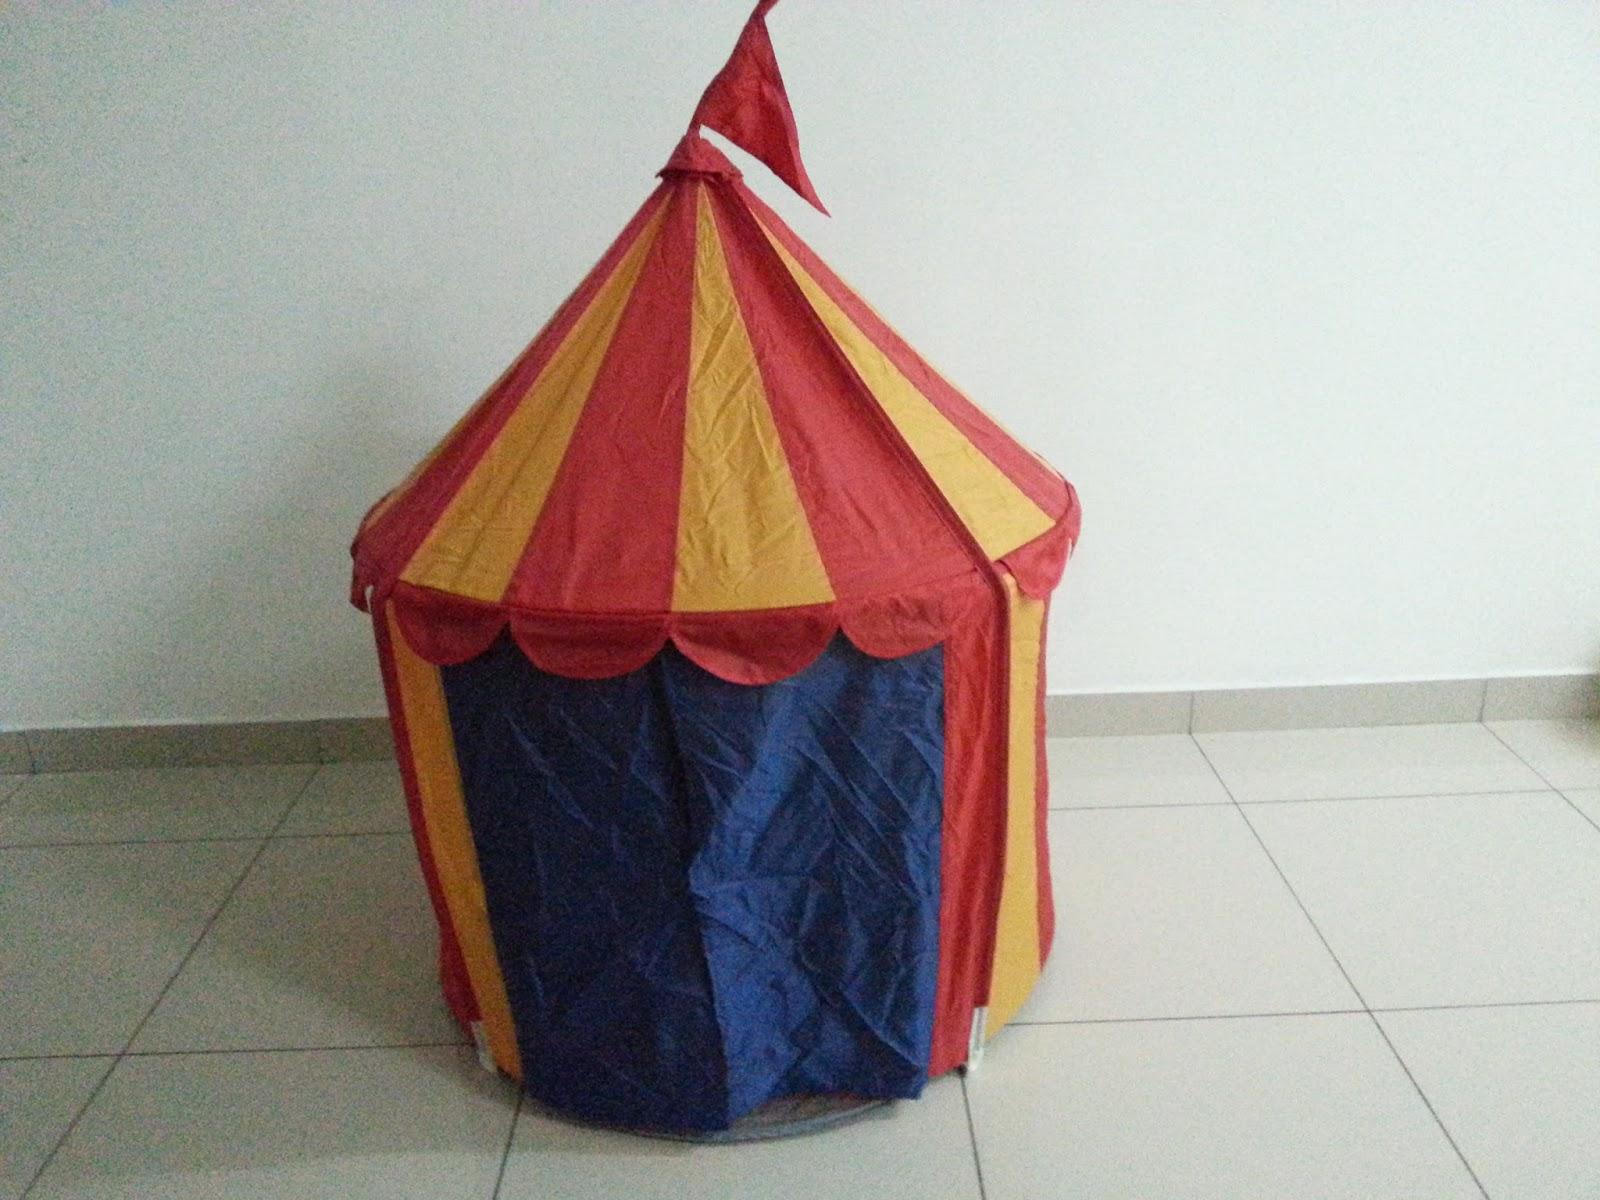 IKEA Circus Tent @ RM49.90 & Sugary Spice u0026 Everything Nice: IKEA Busa Play Tunnel u0026 Cirkustalt ...